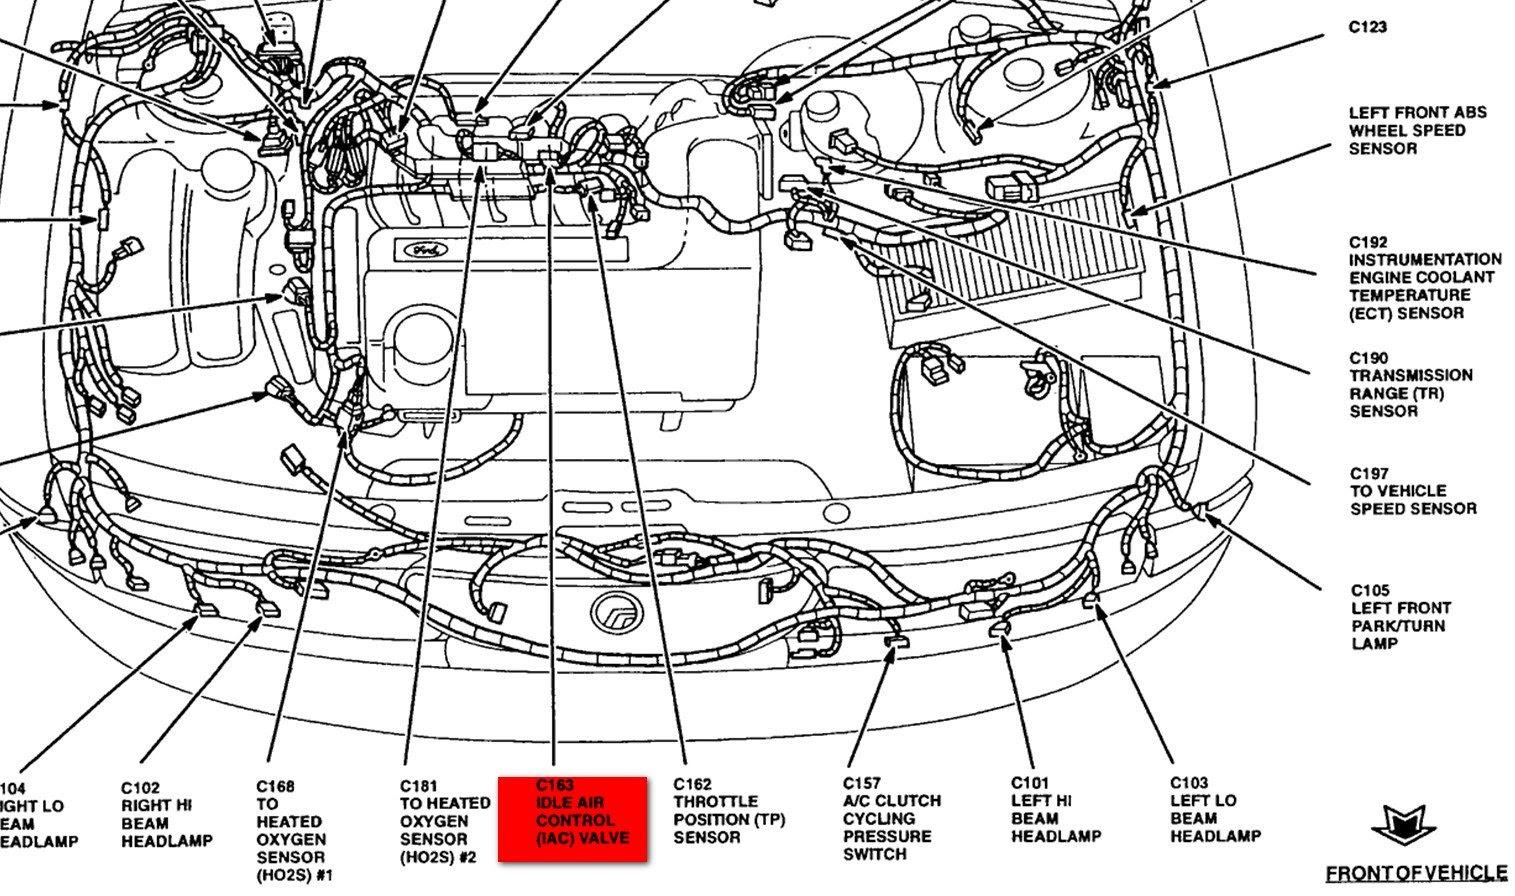 2000 Ford Contour Engine Diagram Wiring Diagrams Pose Close Pose Close Ristorantealletrote It